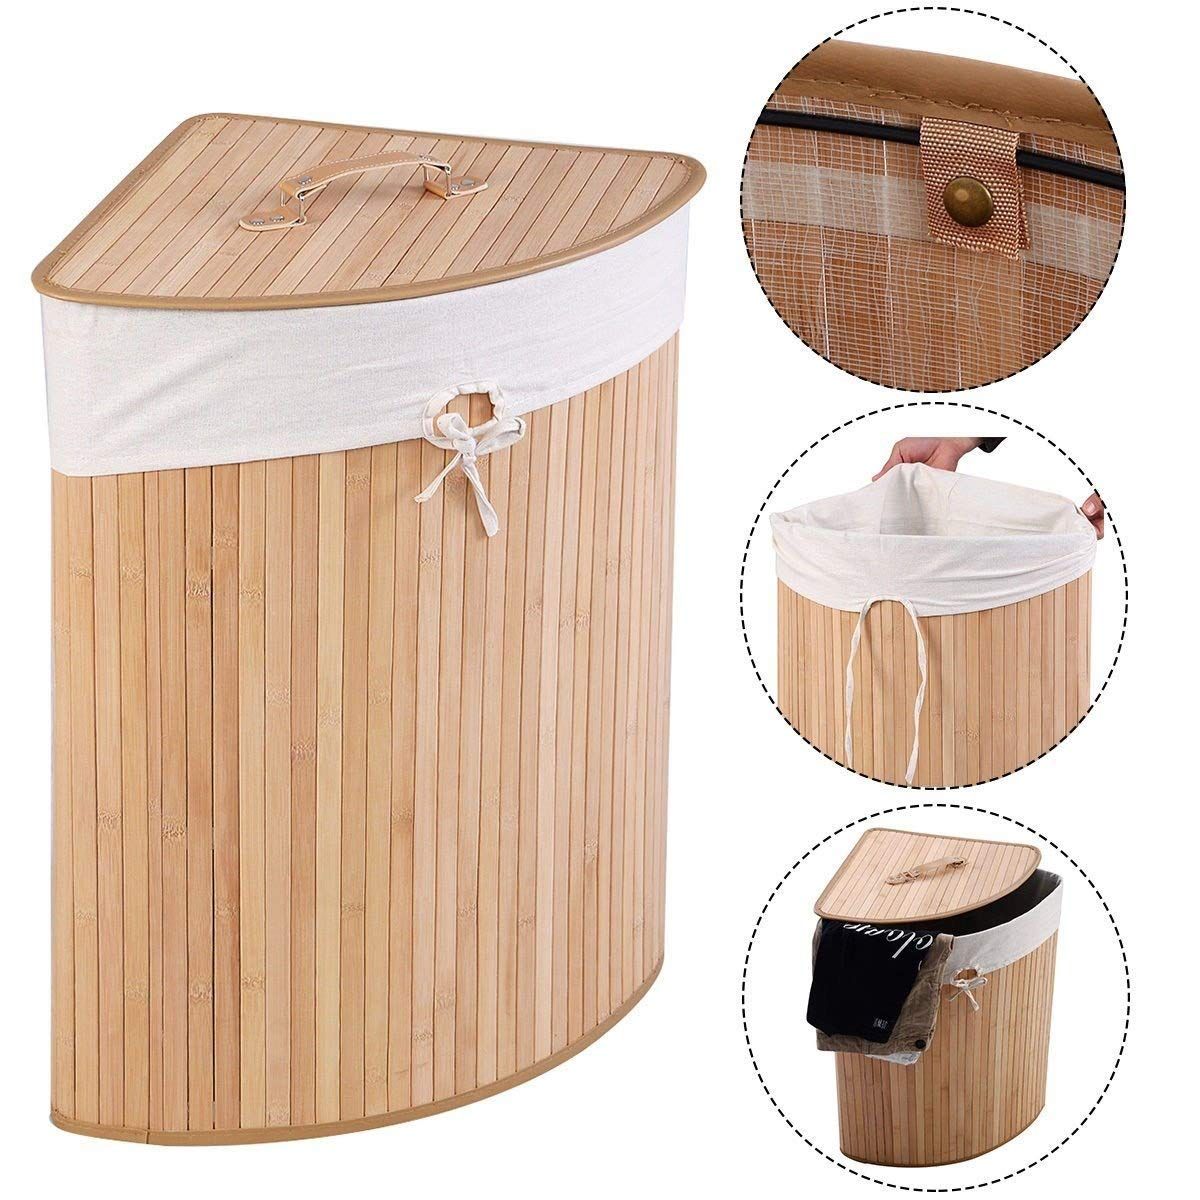 Corner Bamboo Hamper Laundry Basket Washing Cloth Bin Storage Bag Lid Natural